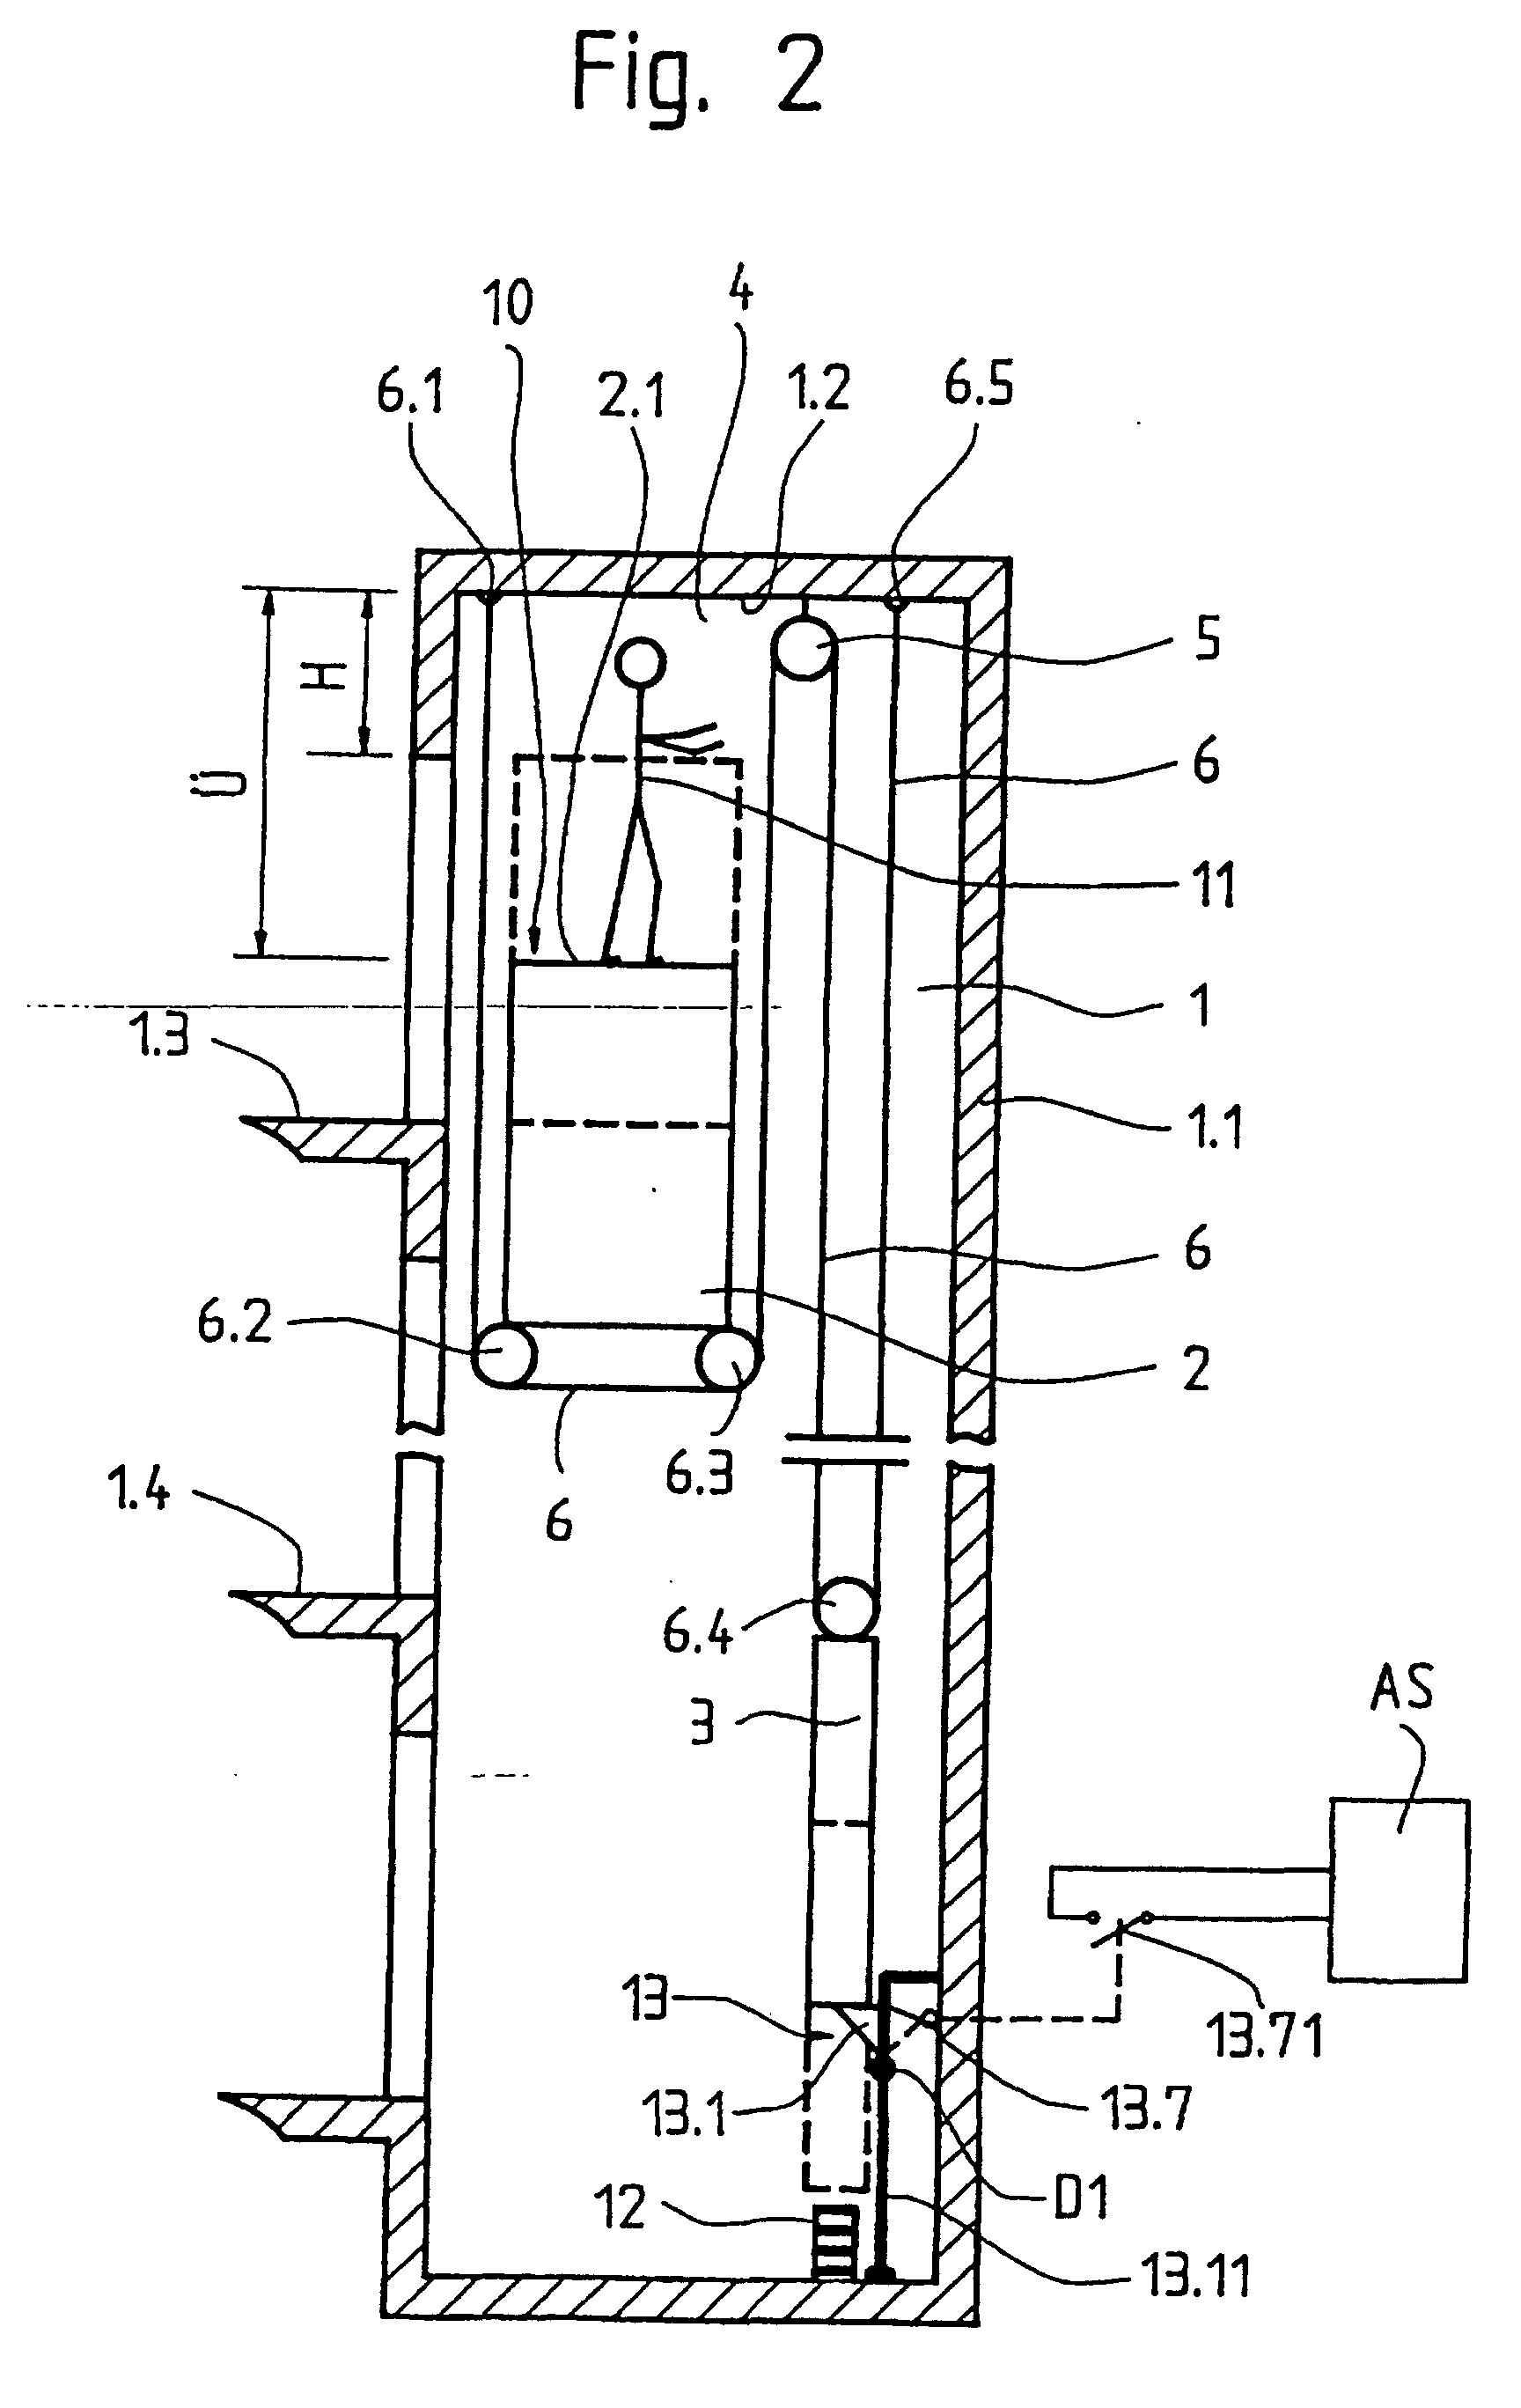 Lift Kit Schematic - All Diagram Schematics Rancho Air Compressor Wiring Diagram on